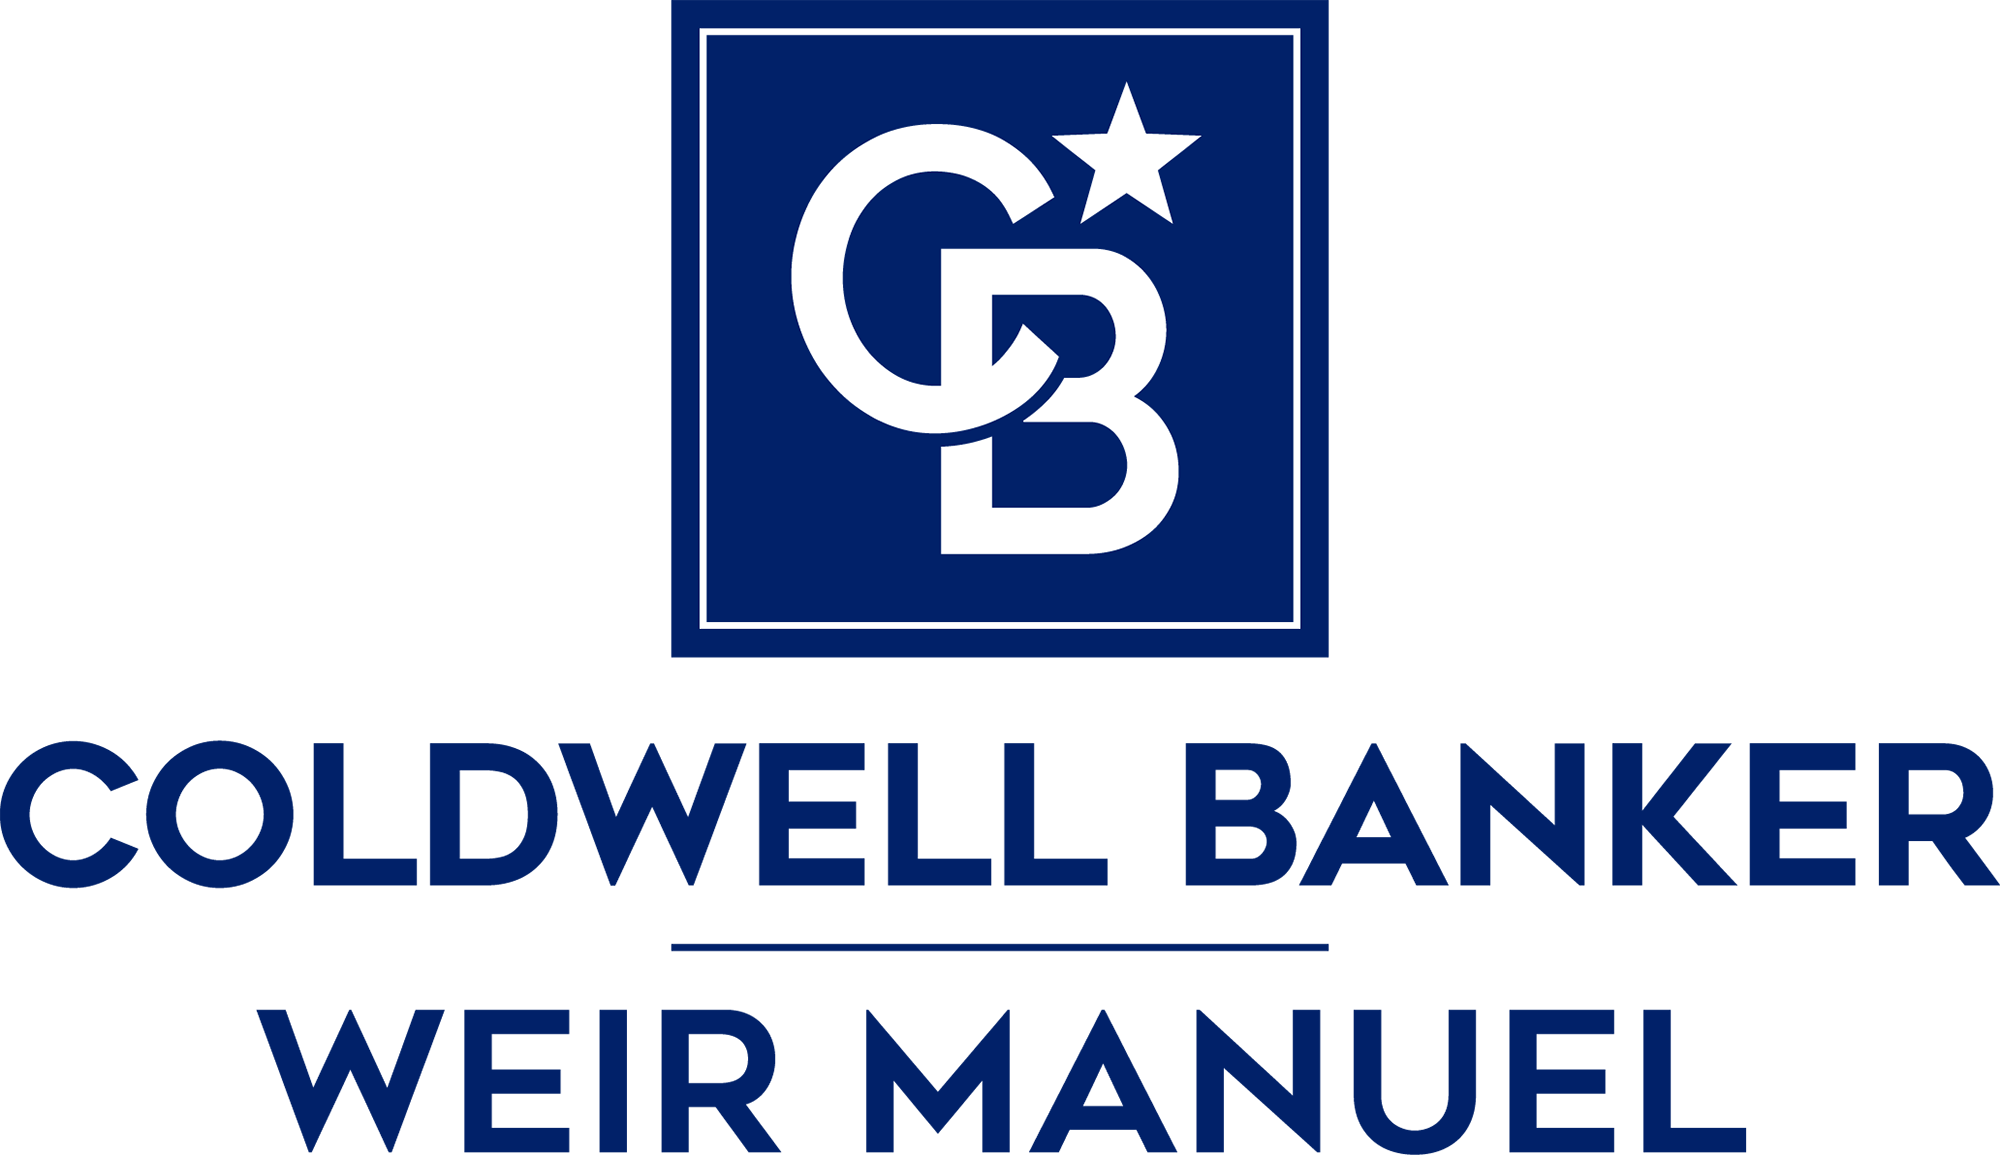 cbwm05 Logo